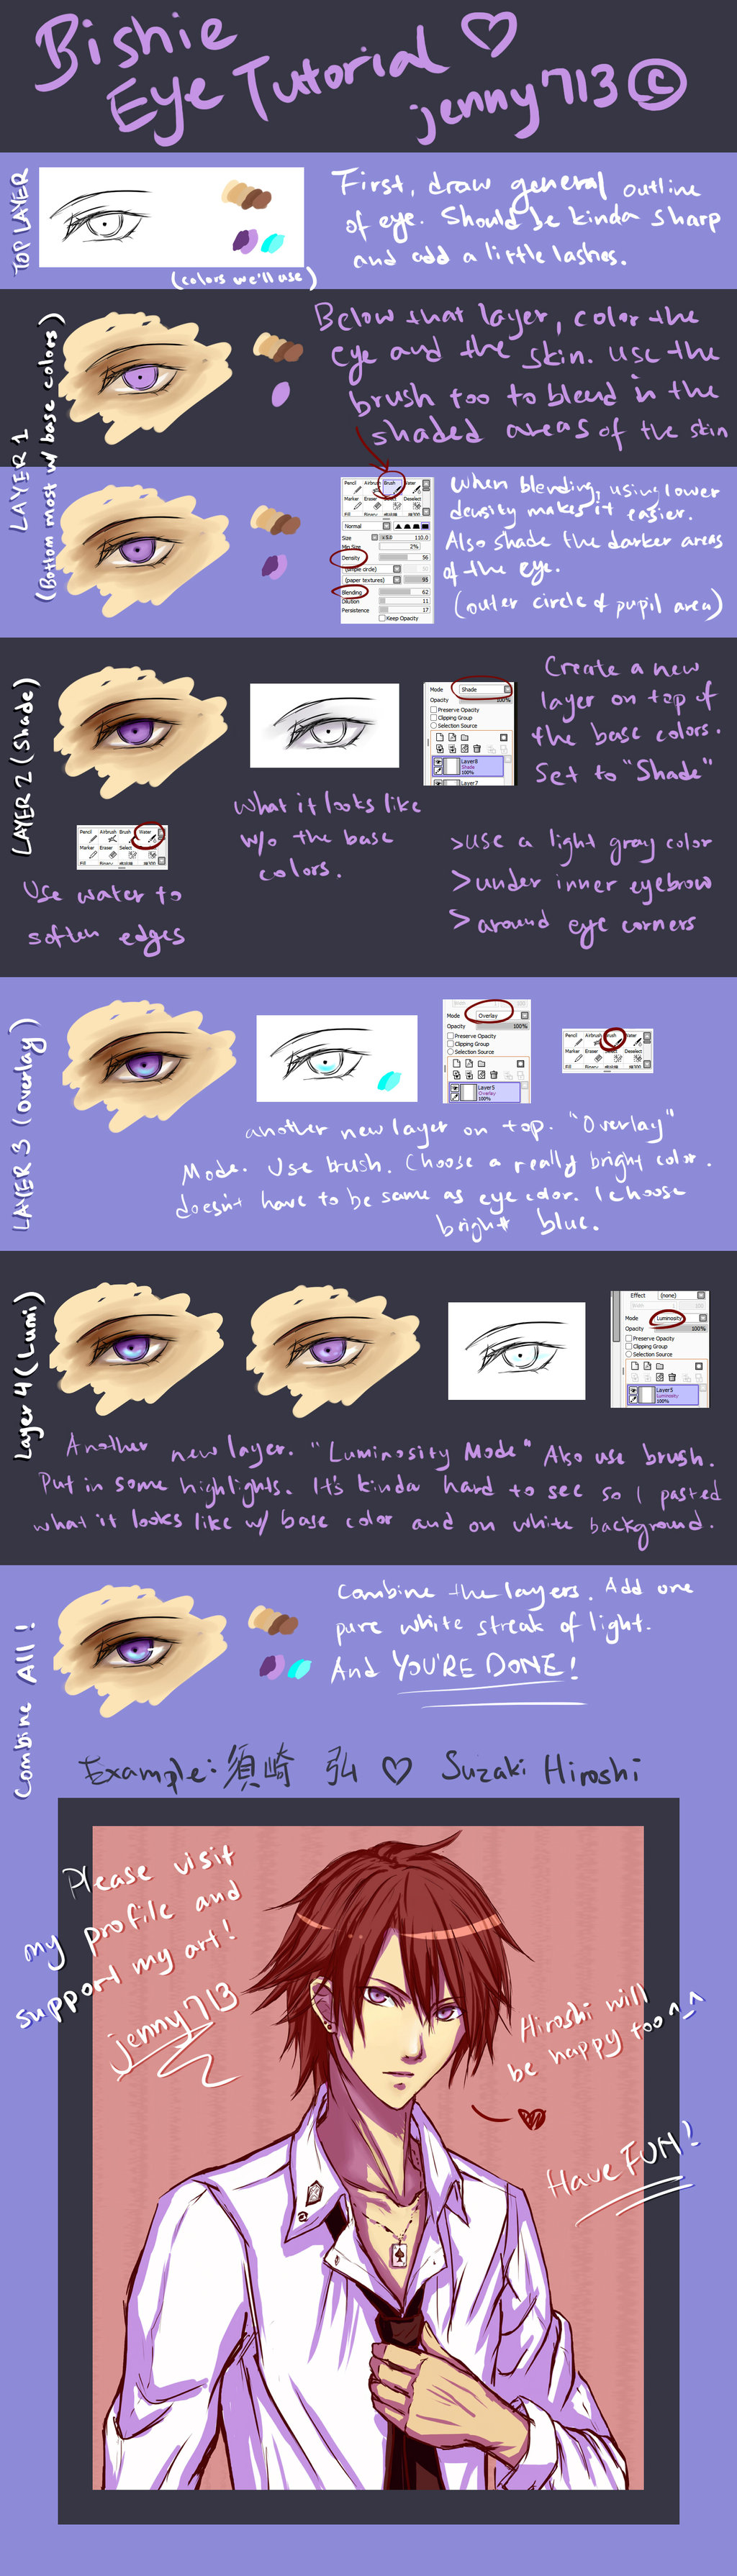 TUTORIAL (Paint Tool SAI) Bishie Anime Male Eye by